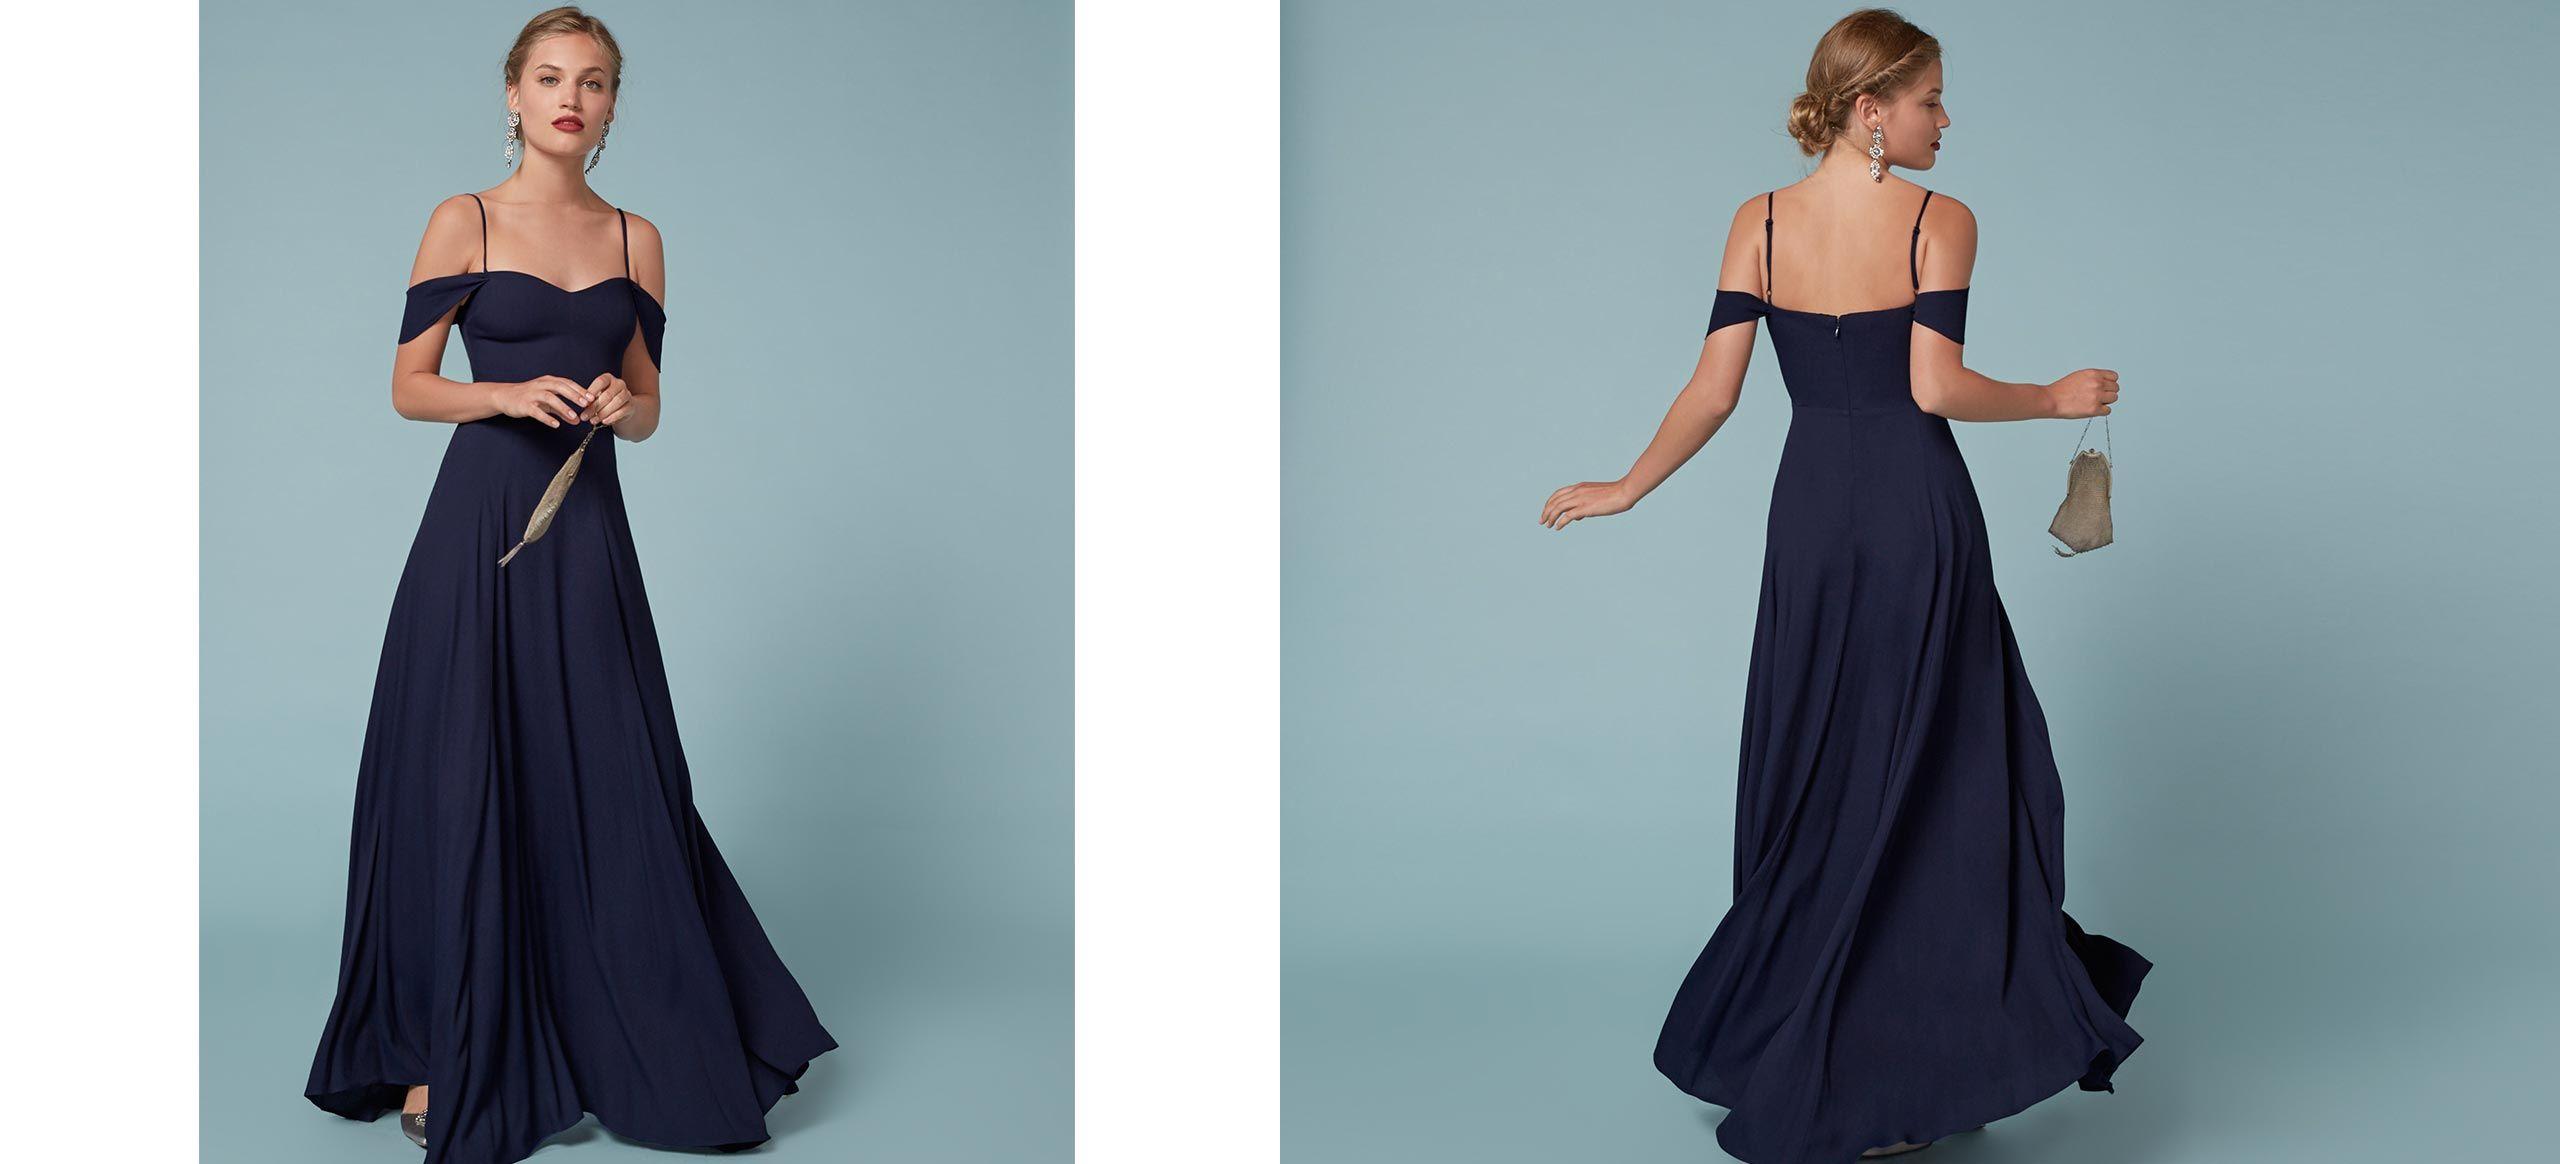 Poppy Dress | Floor length dresses, Cold shoulder and Poppy dress